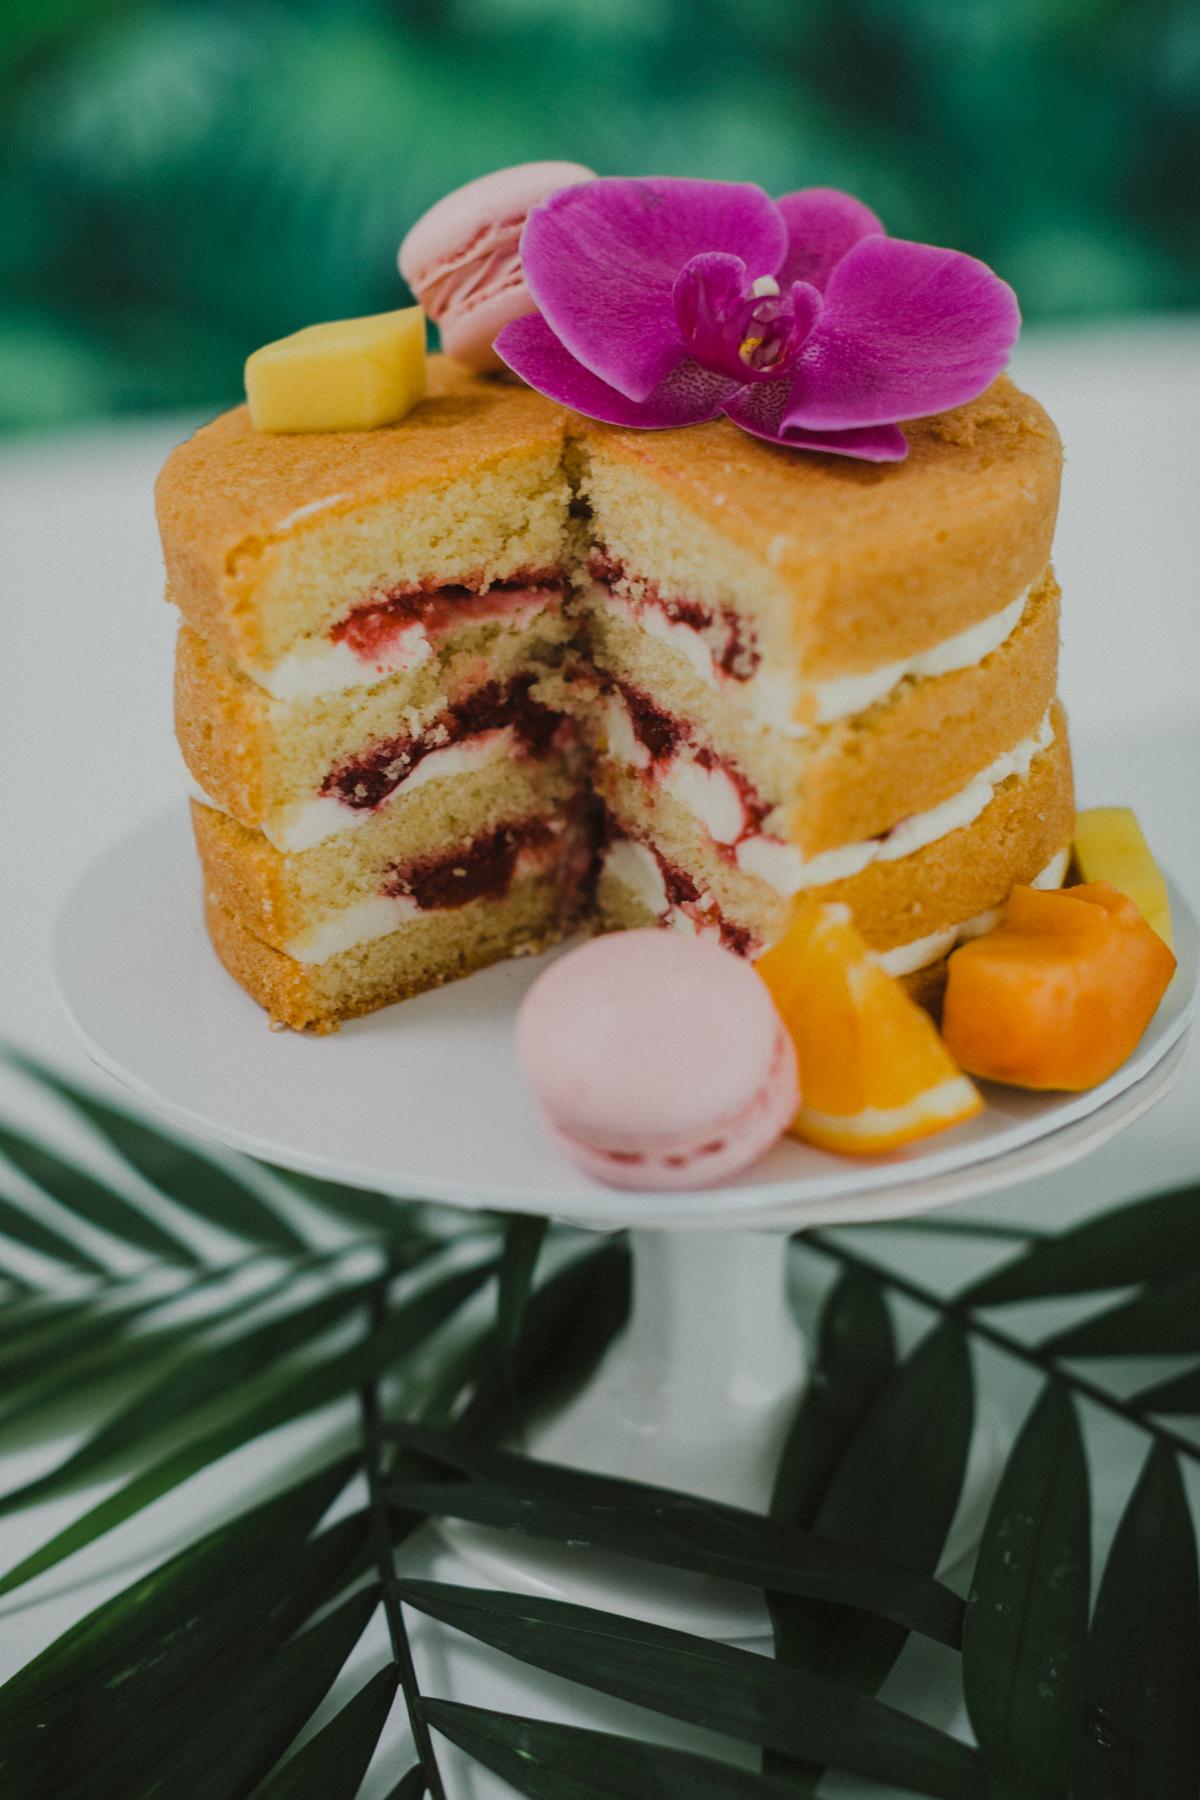 Naked Cake Hochzeitstorte mit Himbeeren